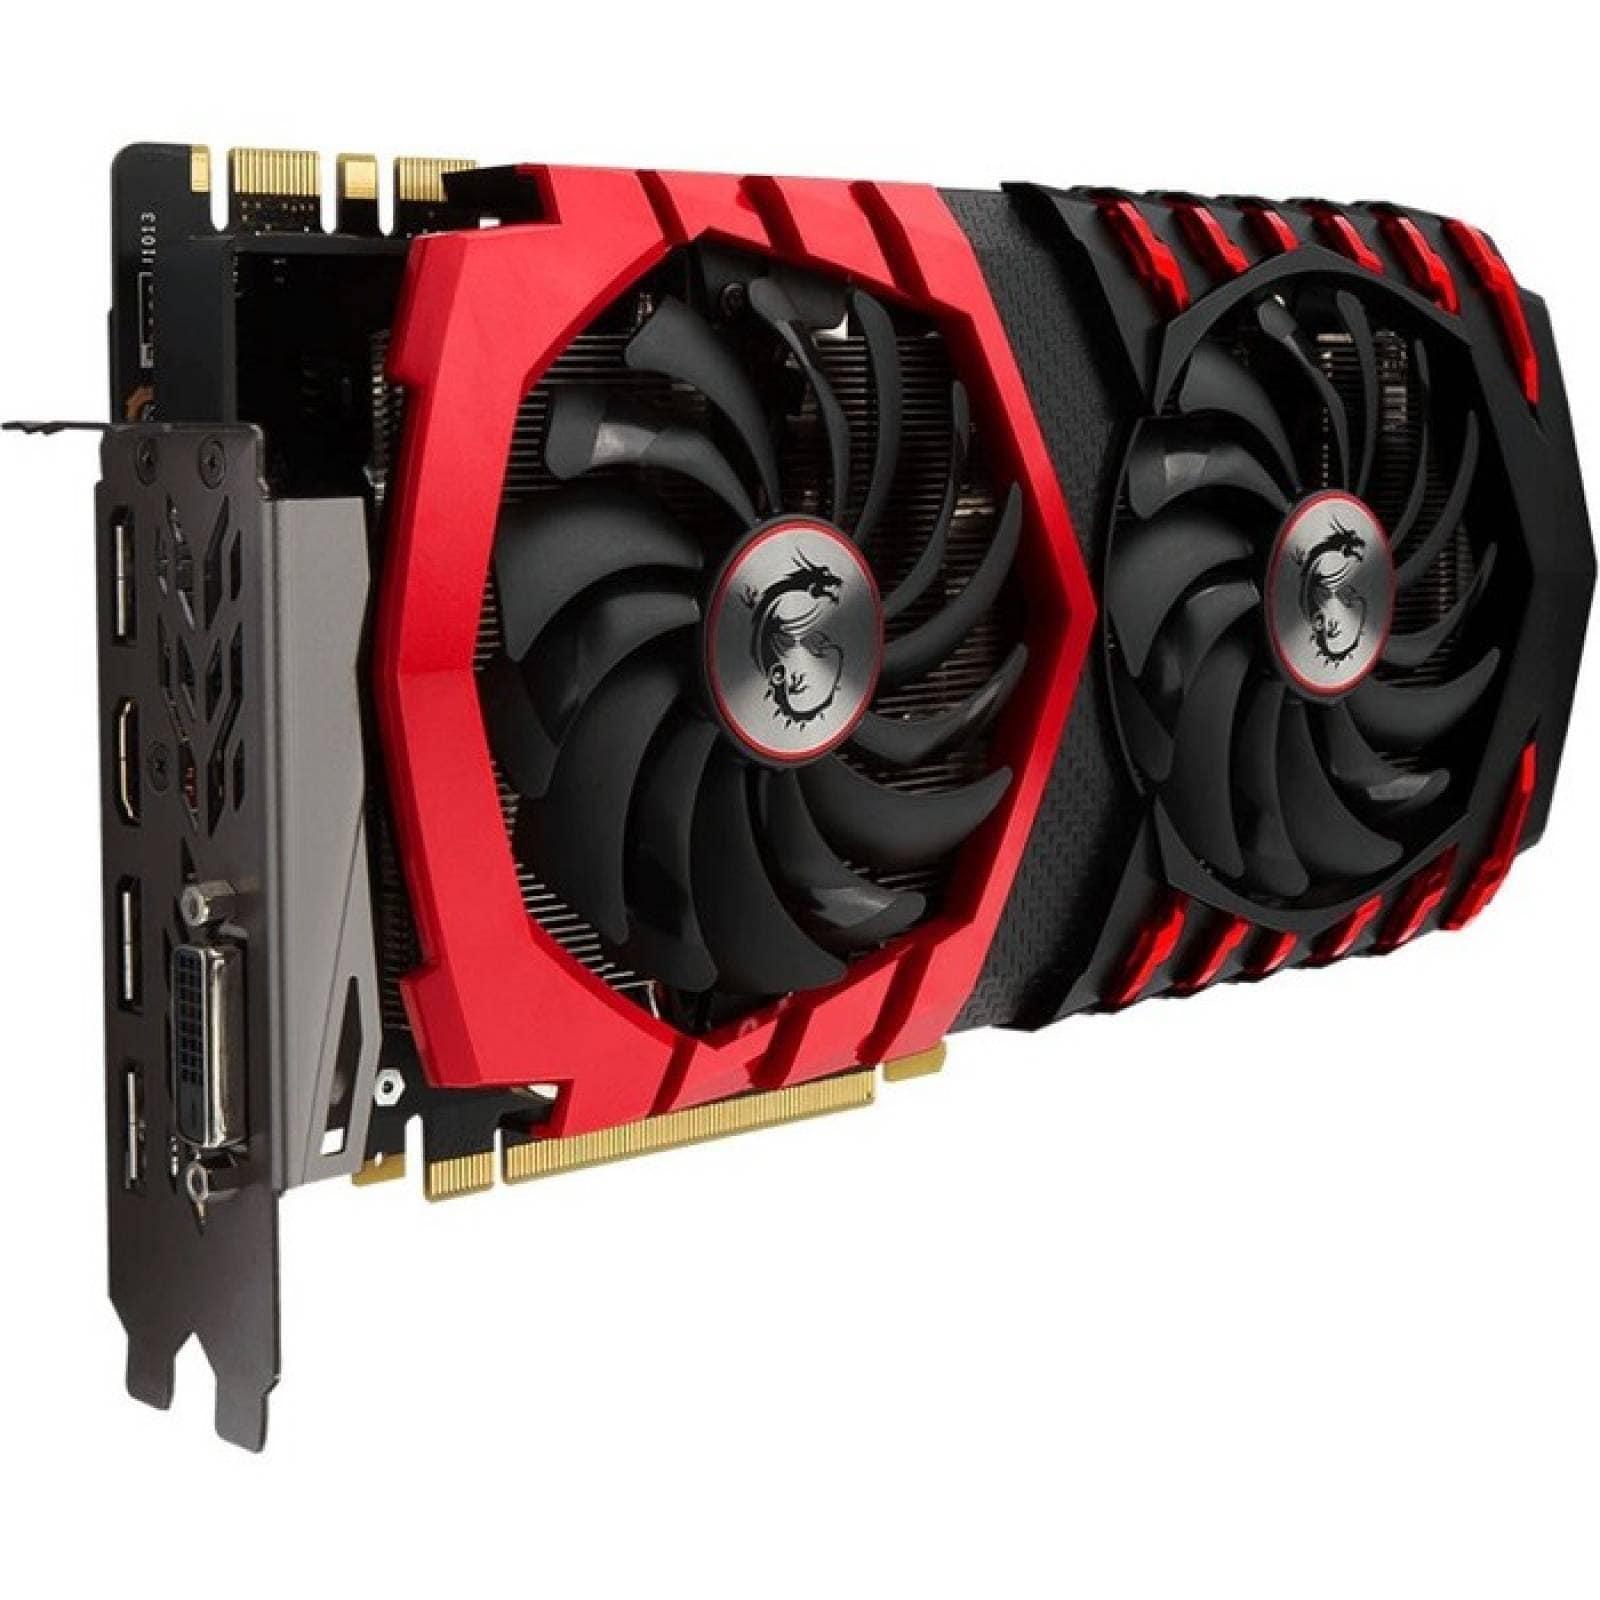 Tarjeta grfica GeForce GTX 1080 MSI GTX 1080 GAMING X 8G  Ncleo de 171 GHz  Reloj Boost de 185 GHz  8 GB GDDR5X